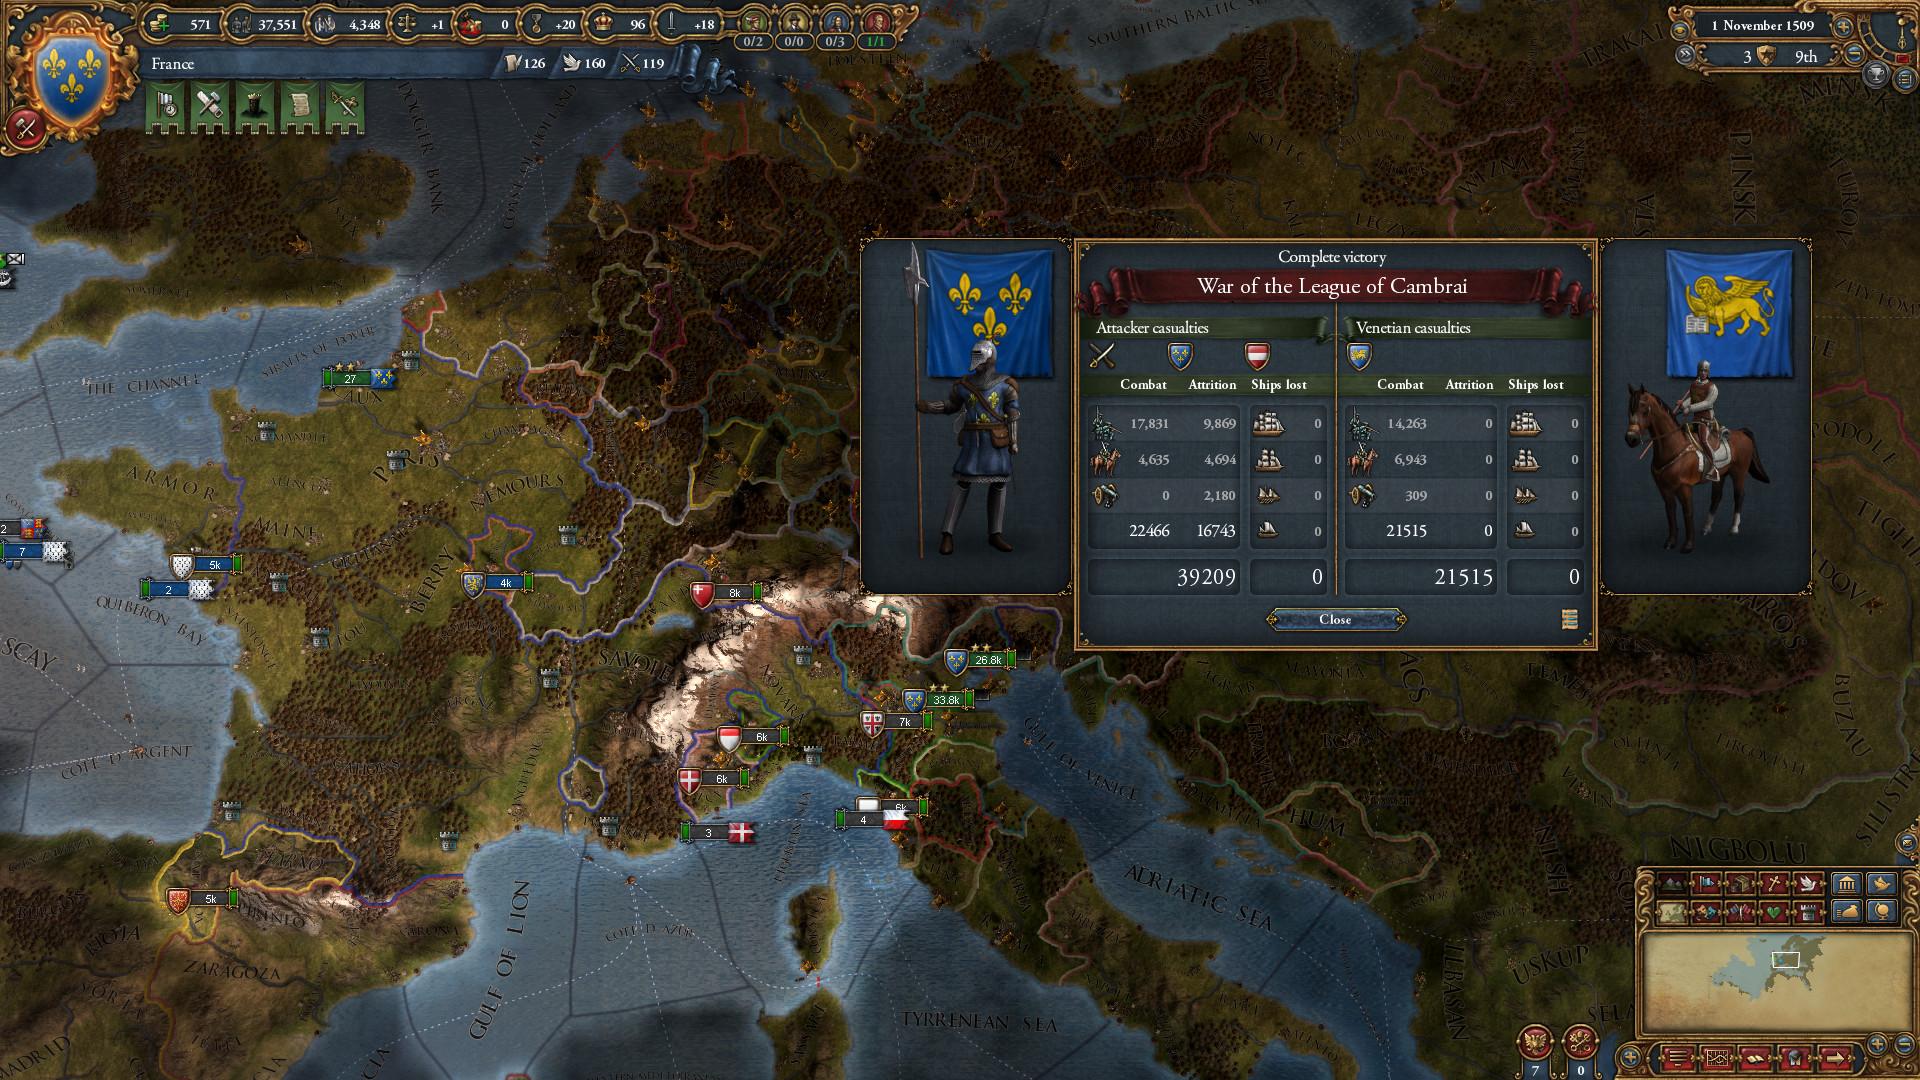 Europa Universalis IV: Rights of Man Screenshot 3